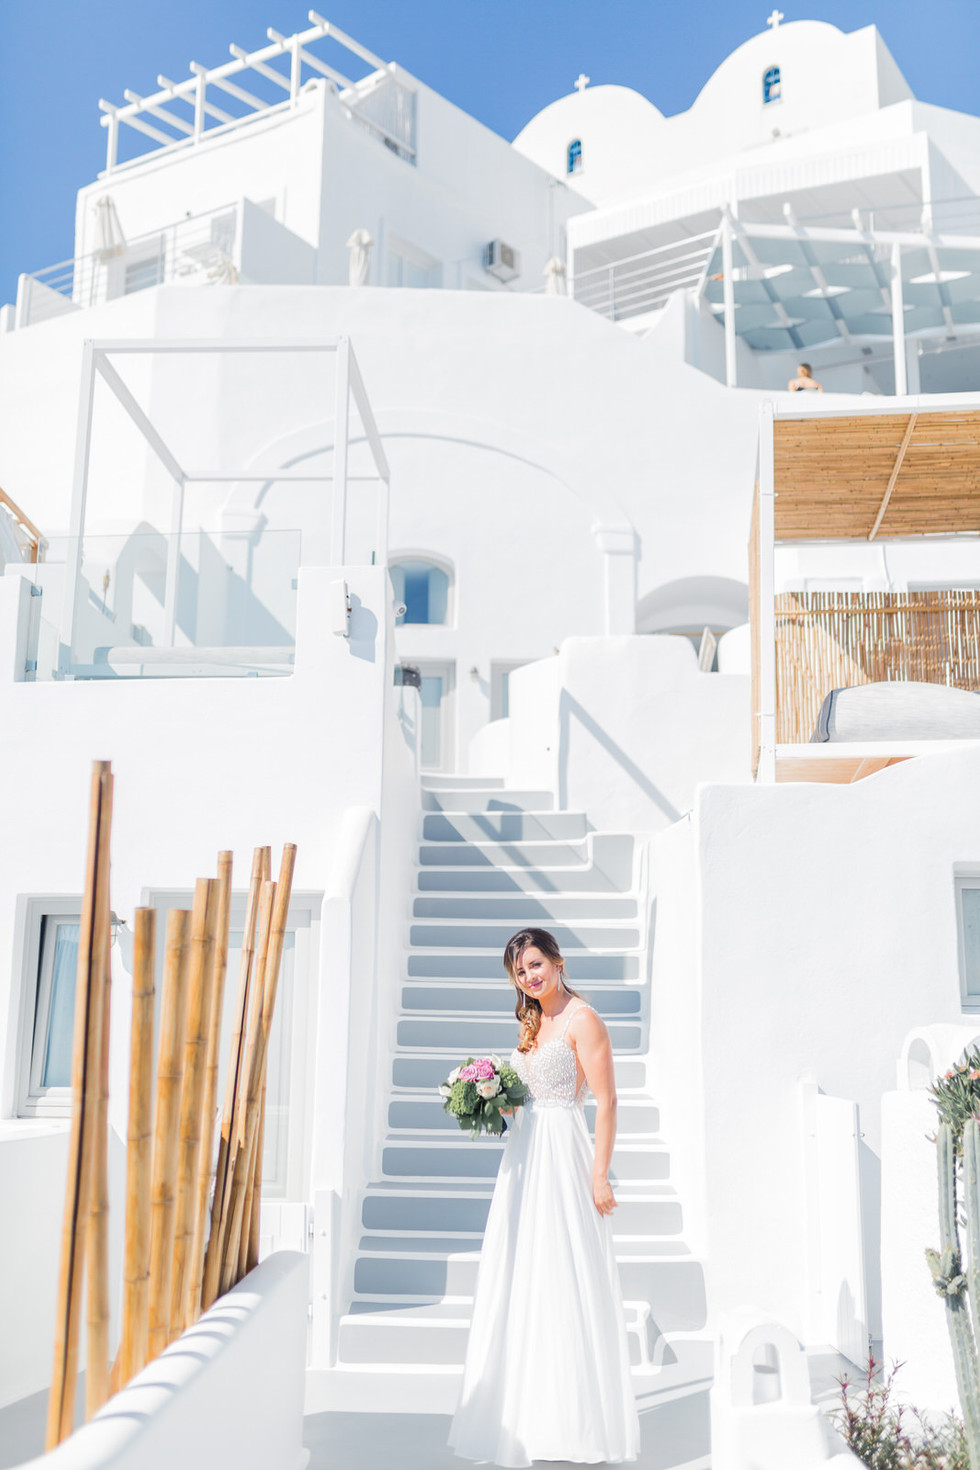 Santorini-Elopement- wedding-134.jpg